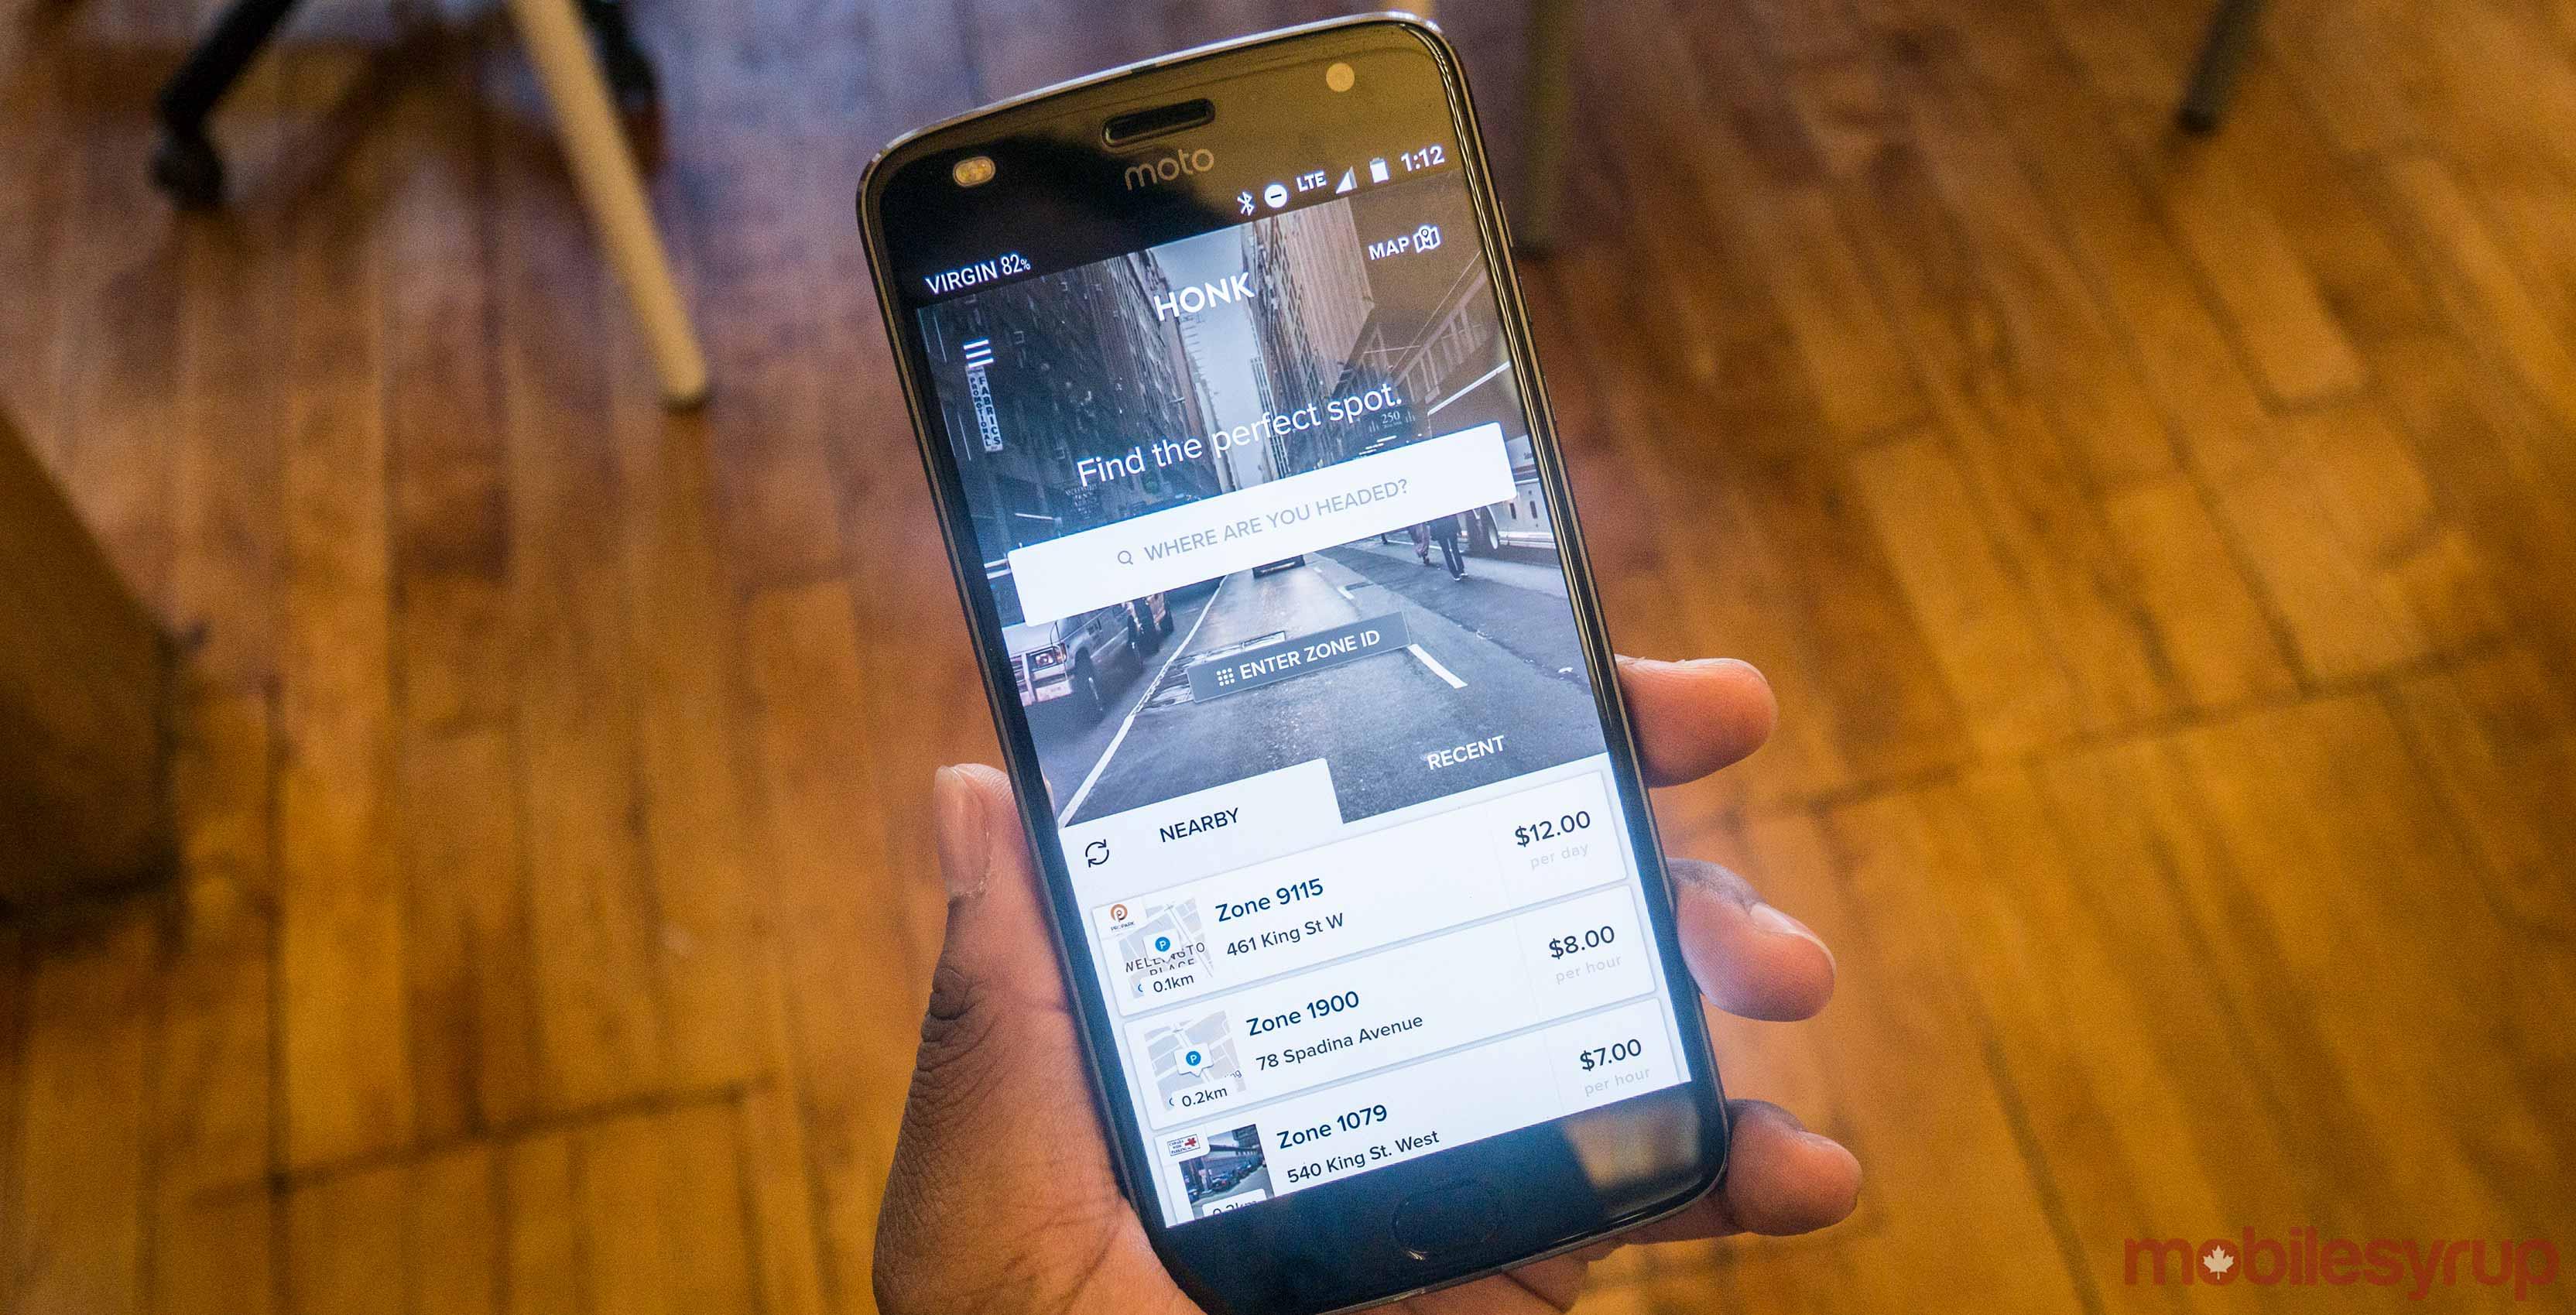 Honk Mobile on Moto Z2 Play